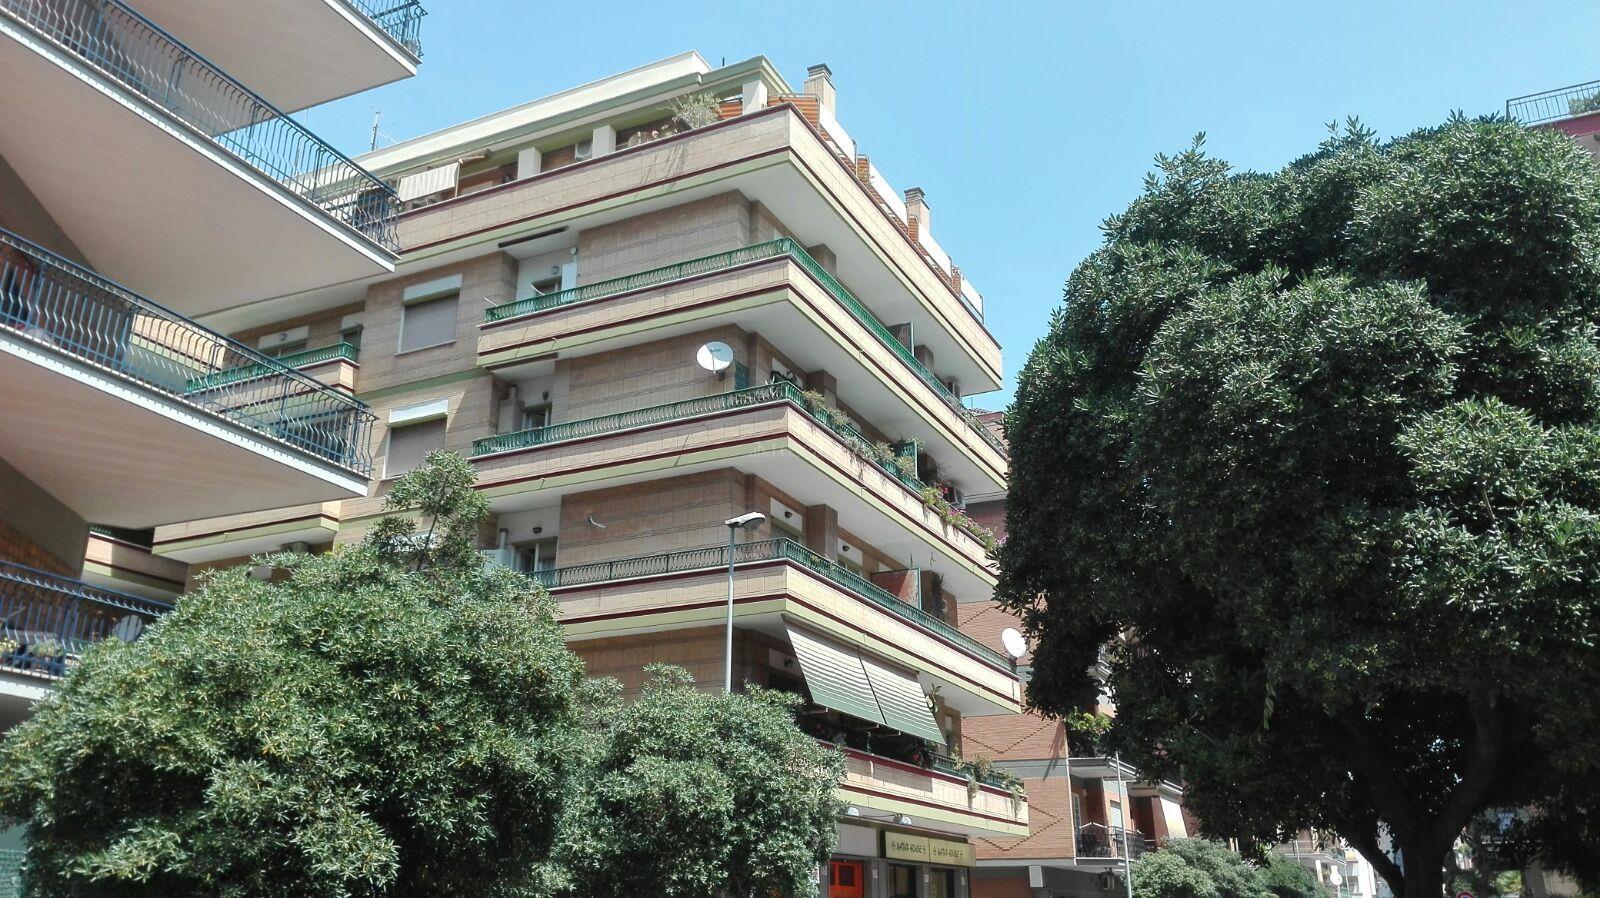 Vendita casa a roma in via panfili ostia centro 142 2016 for Compro casa roma centro